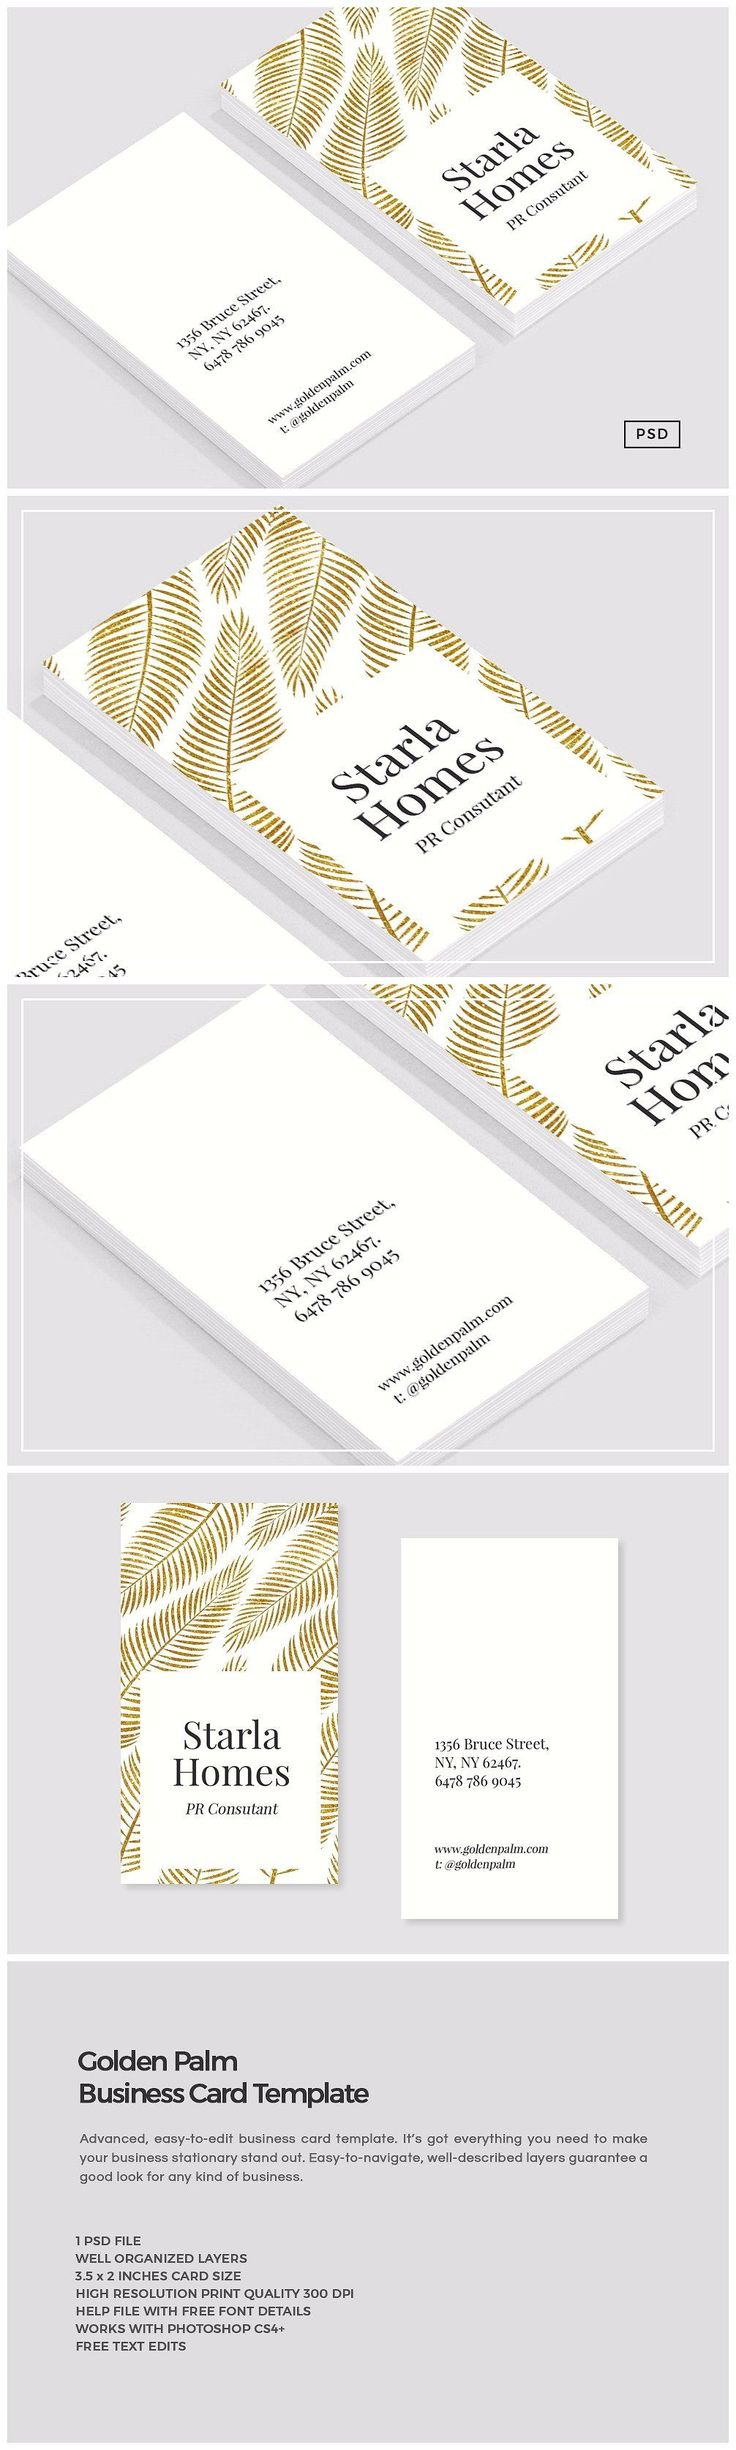 9311 best unique business card design images on pinterest golden palm business card template by the design label on creativemarket magicingreecefo Images